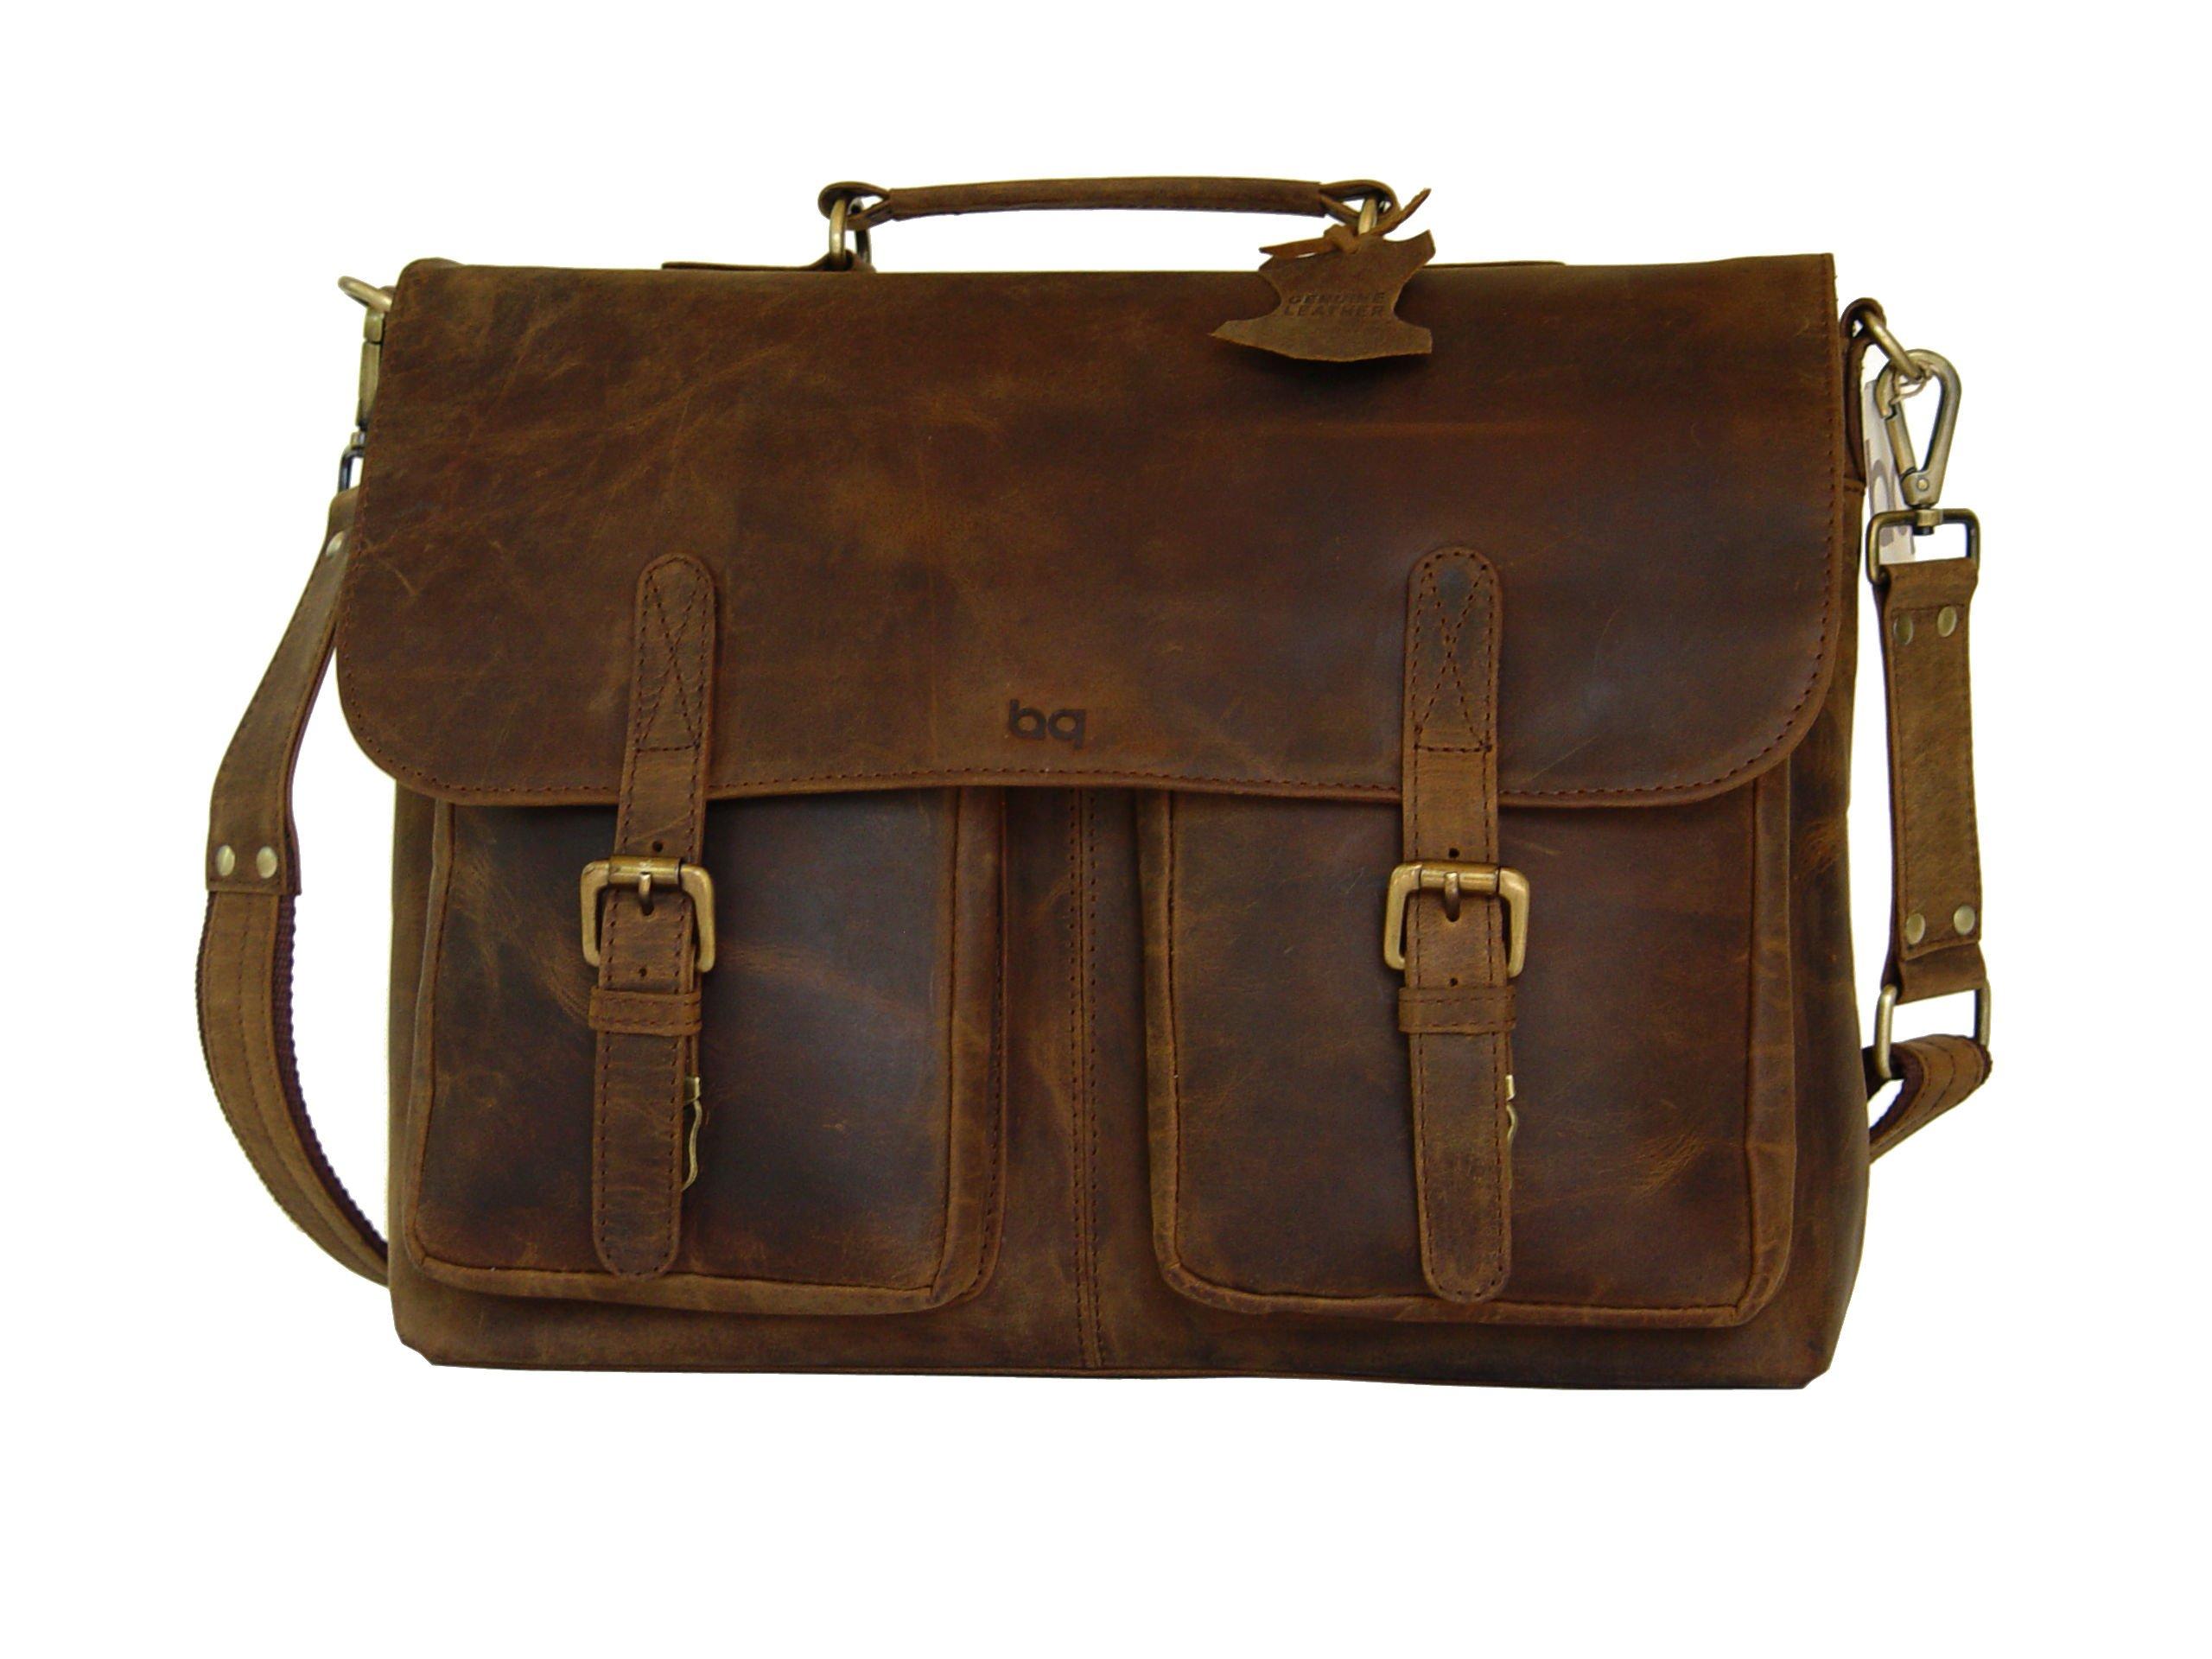 Full Grain Leather Briefcase, Shoulder Bag, Messenger Bag, Laptop Satchel by BASIC GEAR by Basic Gear